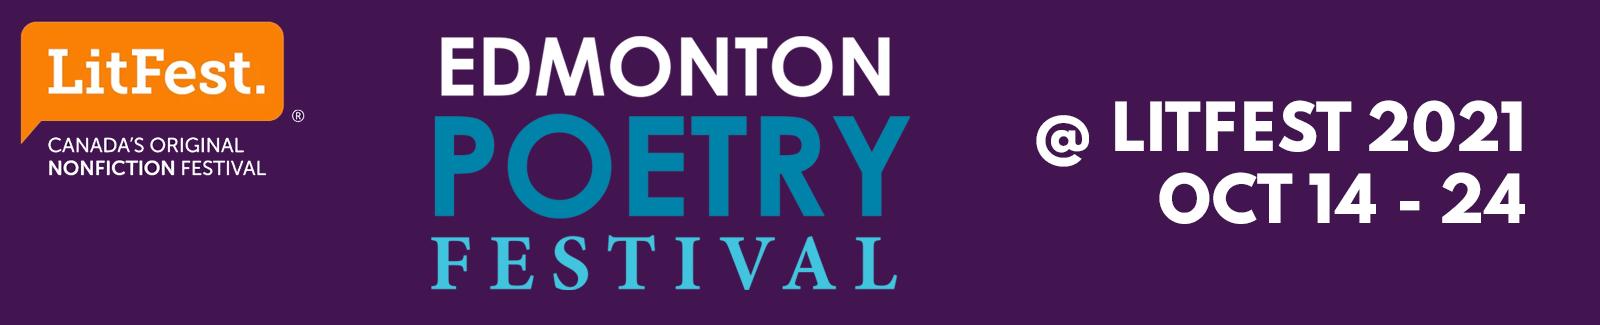 Edmonton Poetry Festival @ LitFest 2021 Oct 14-24,2021